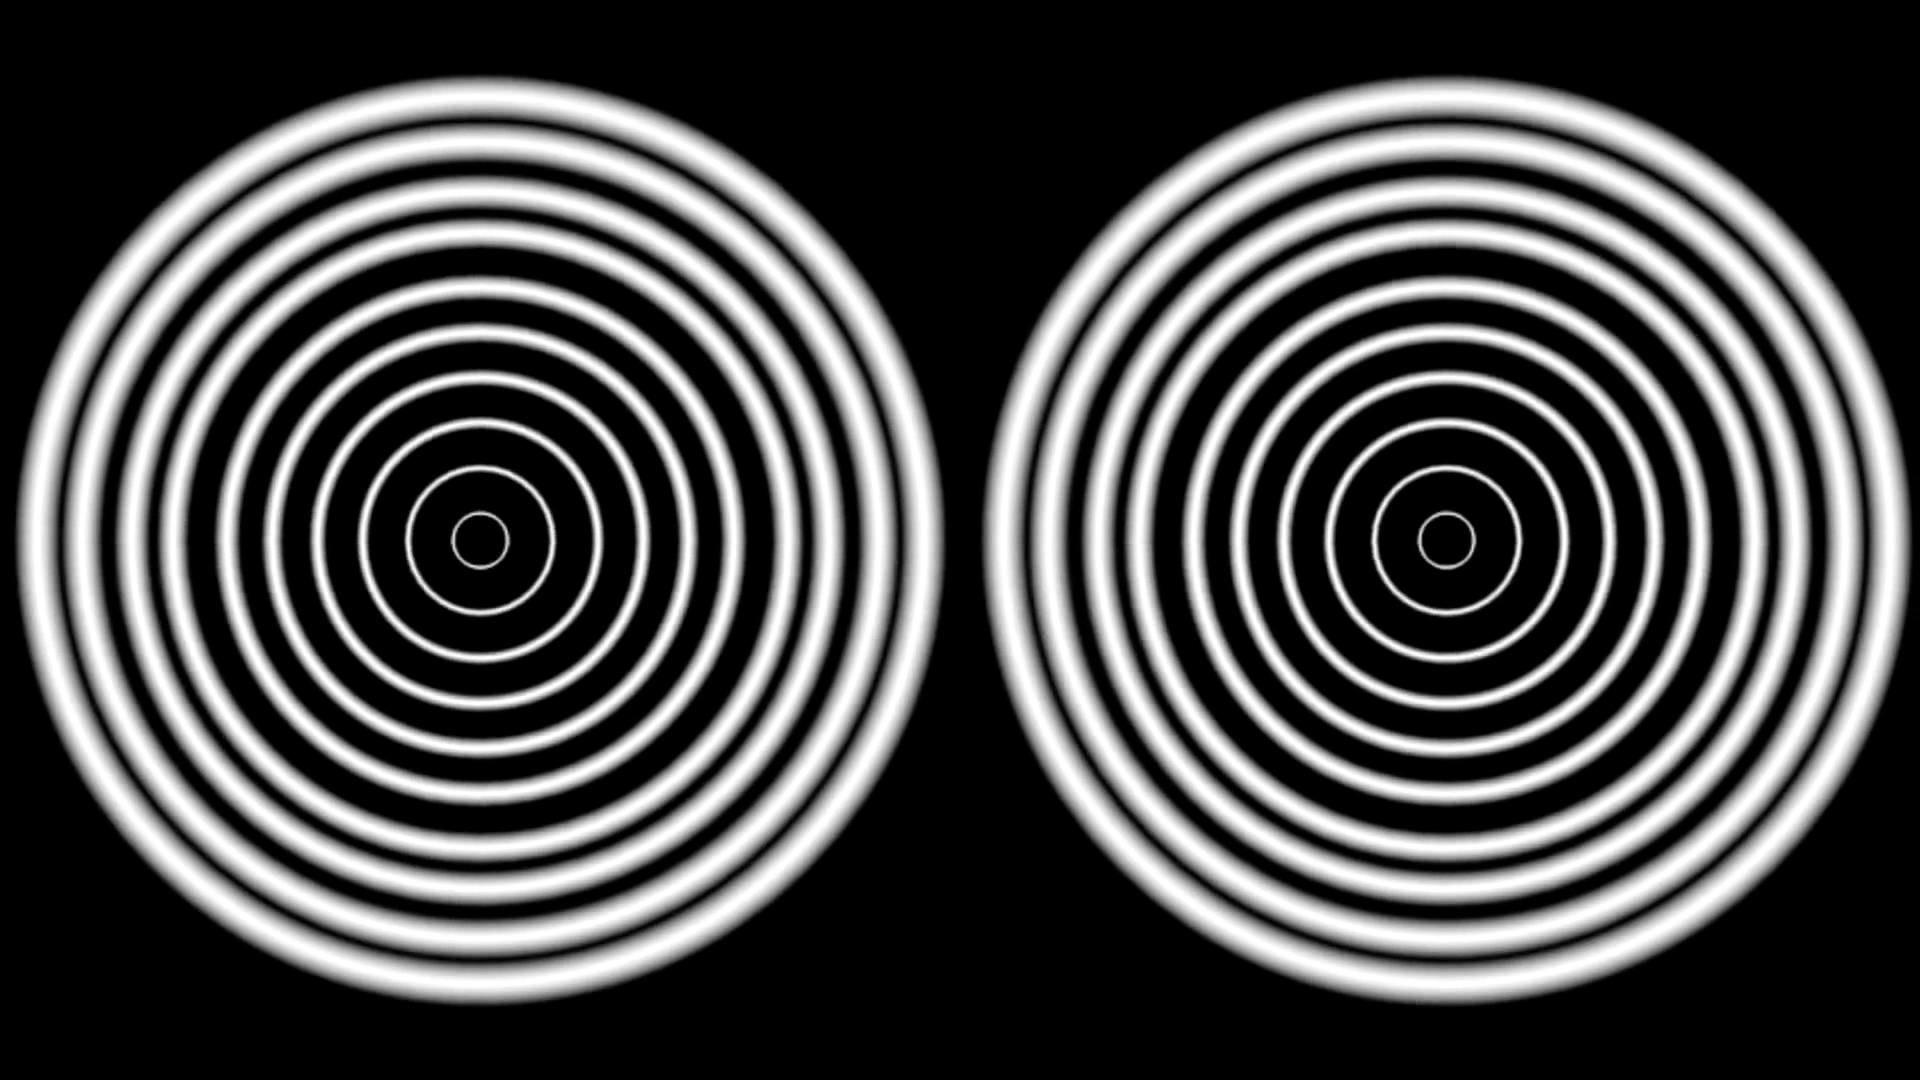 Hypnosis Video HD WARNING BLUR VISION AND YOU MAY SEE THINGS, THINGS  APPEARING BIGGER – YouTube